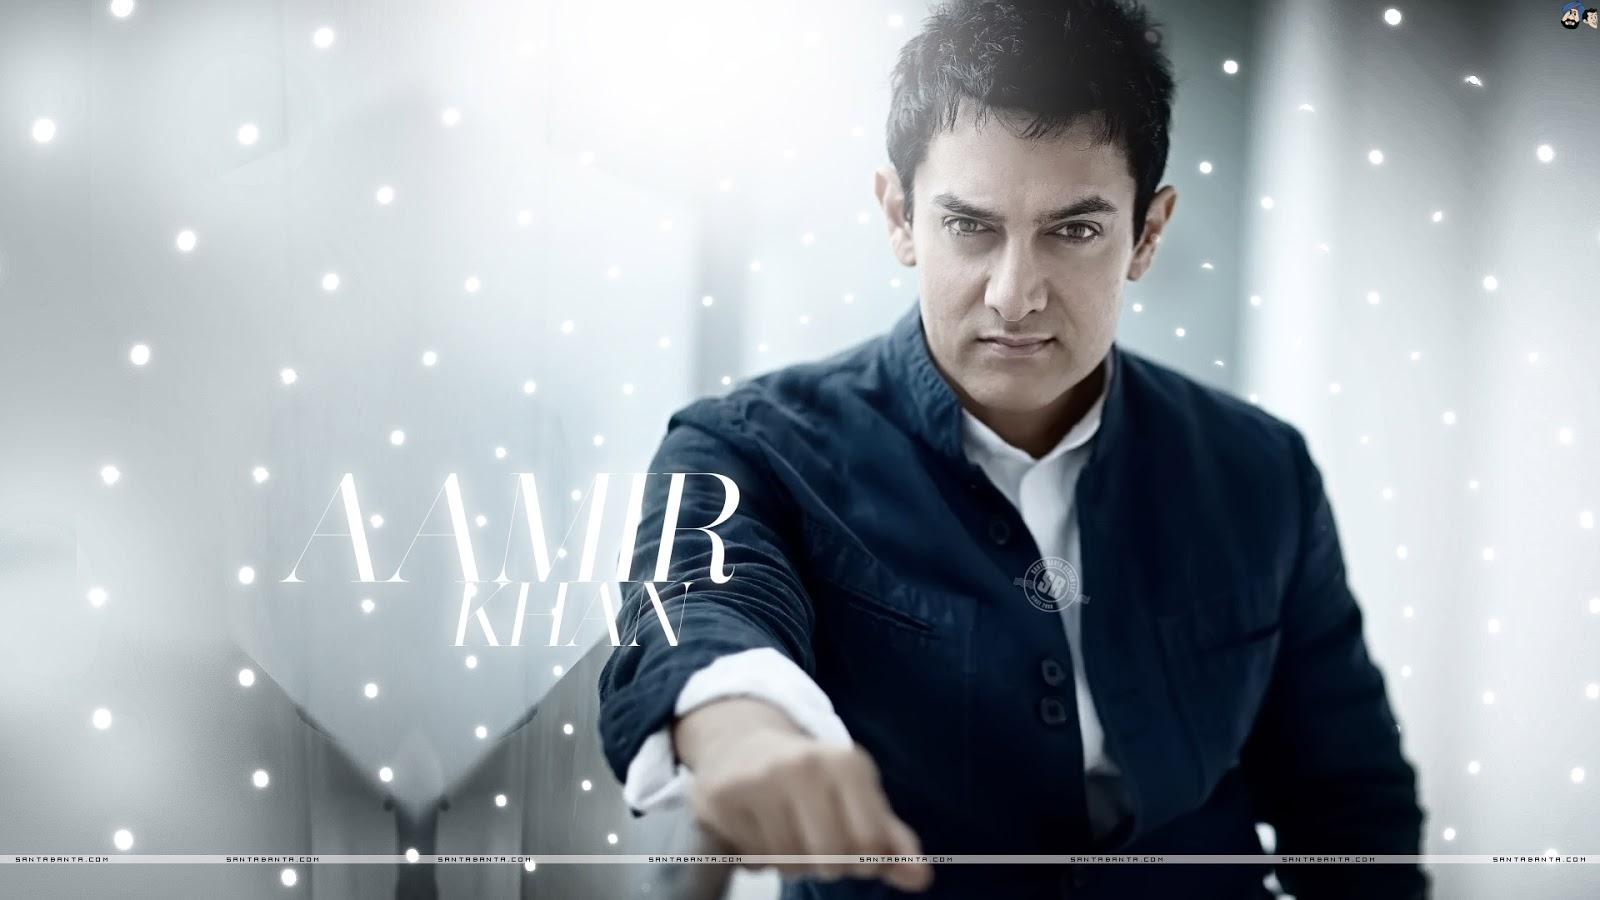 Aamir Khan Wallpapers HD Backgrounds Images Pics Photos 1600x900